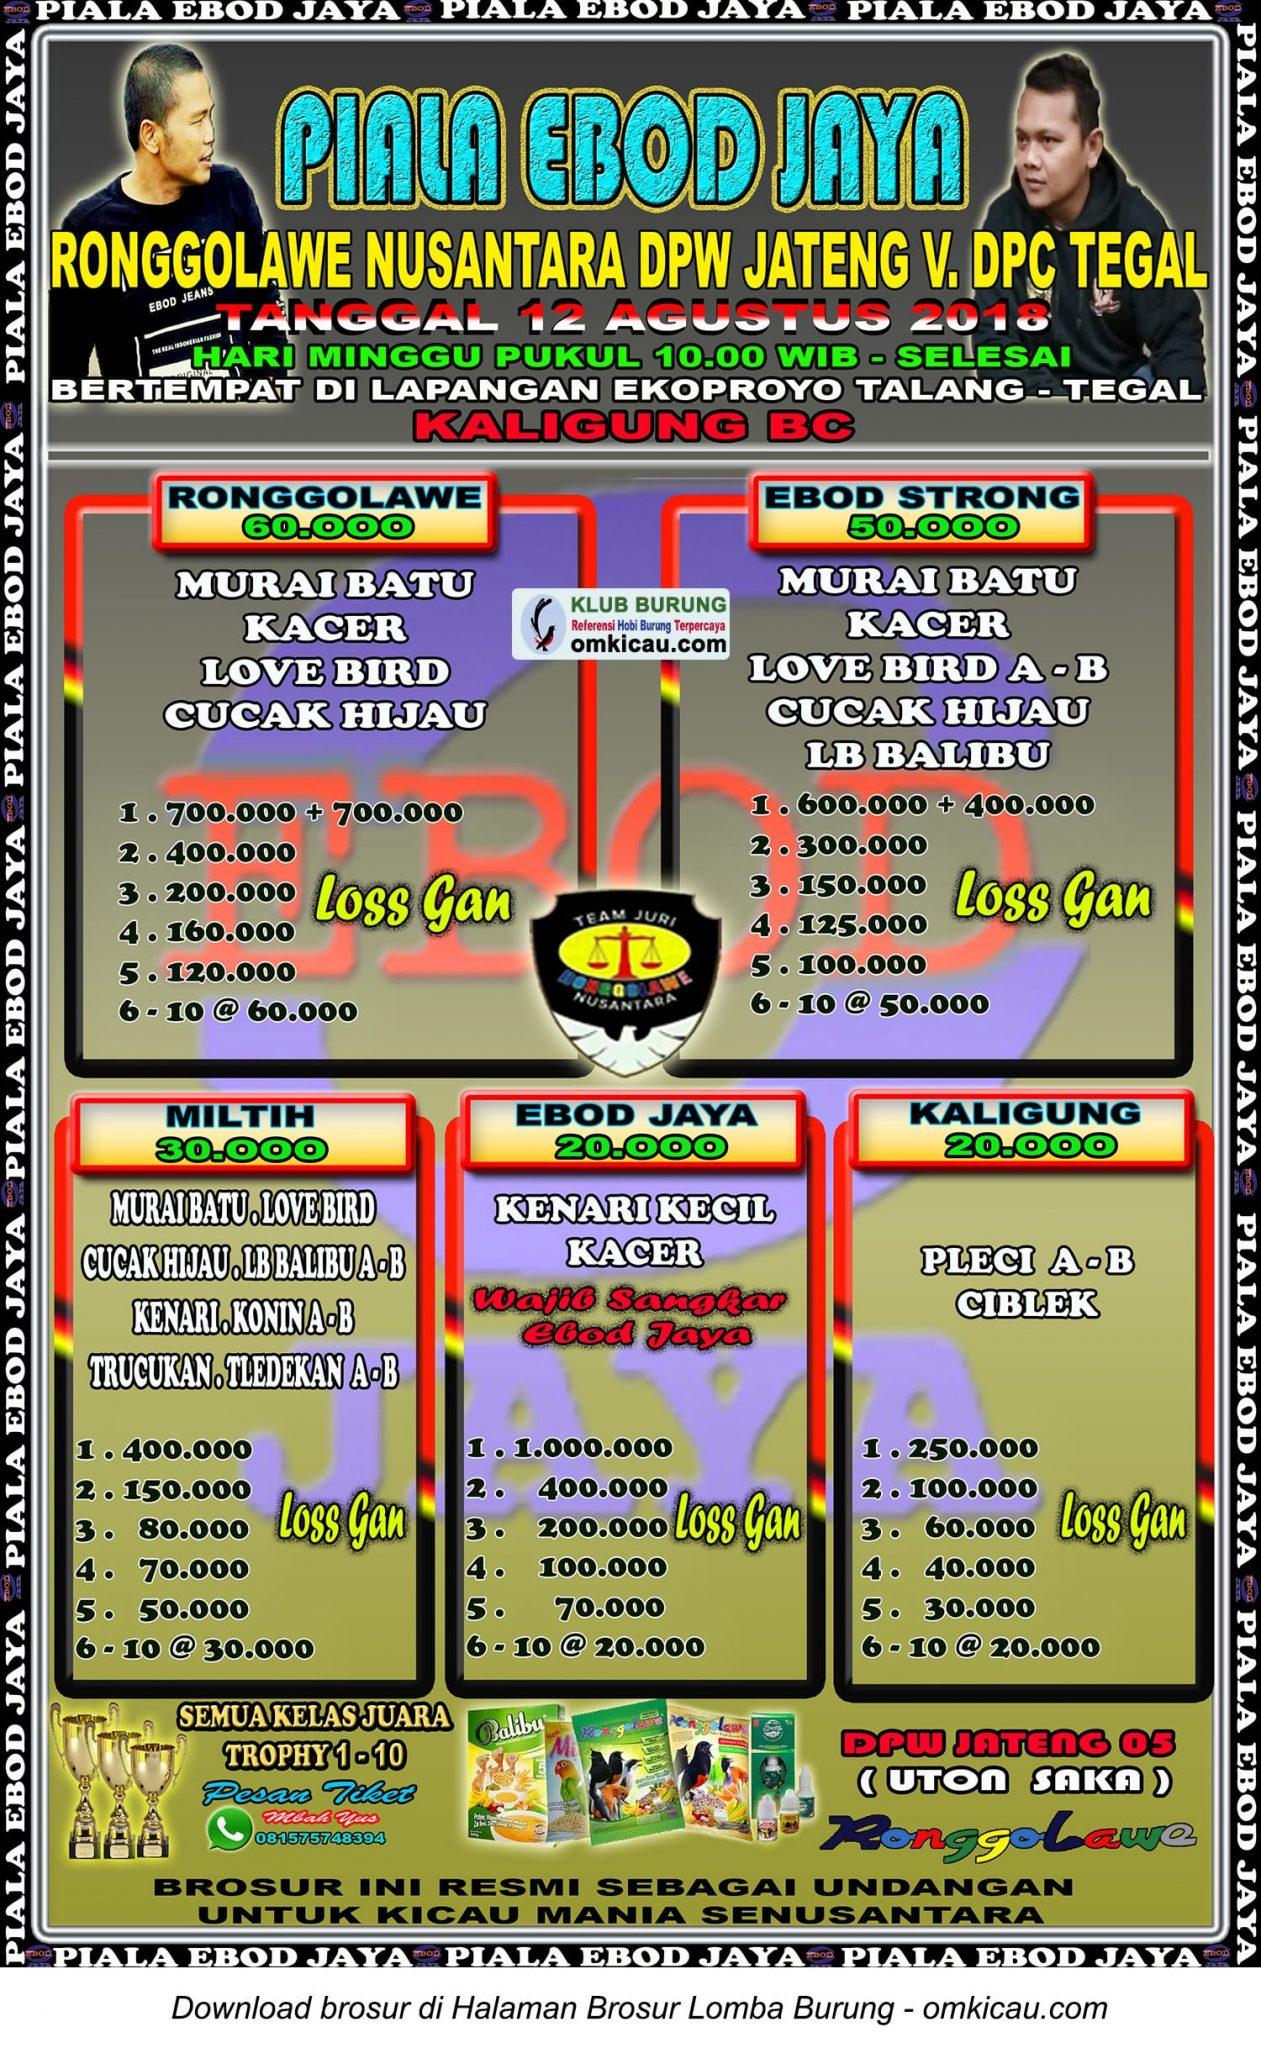 Piala Ebod Jaya